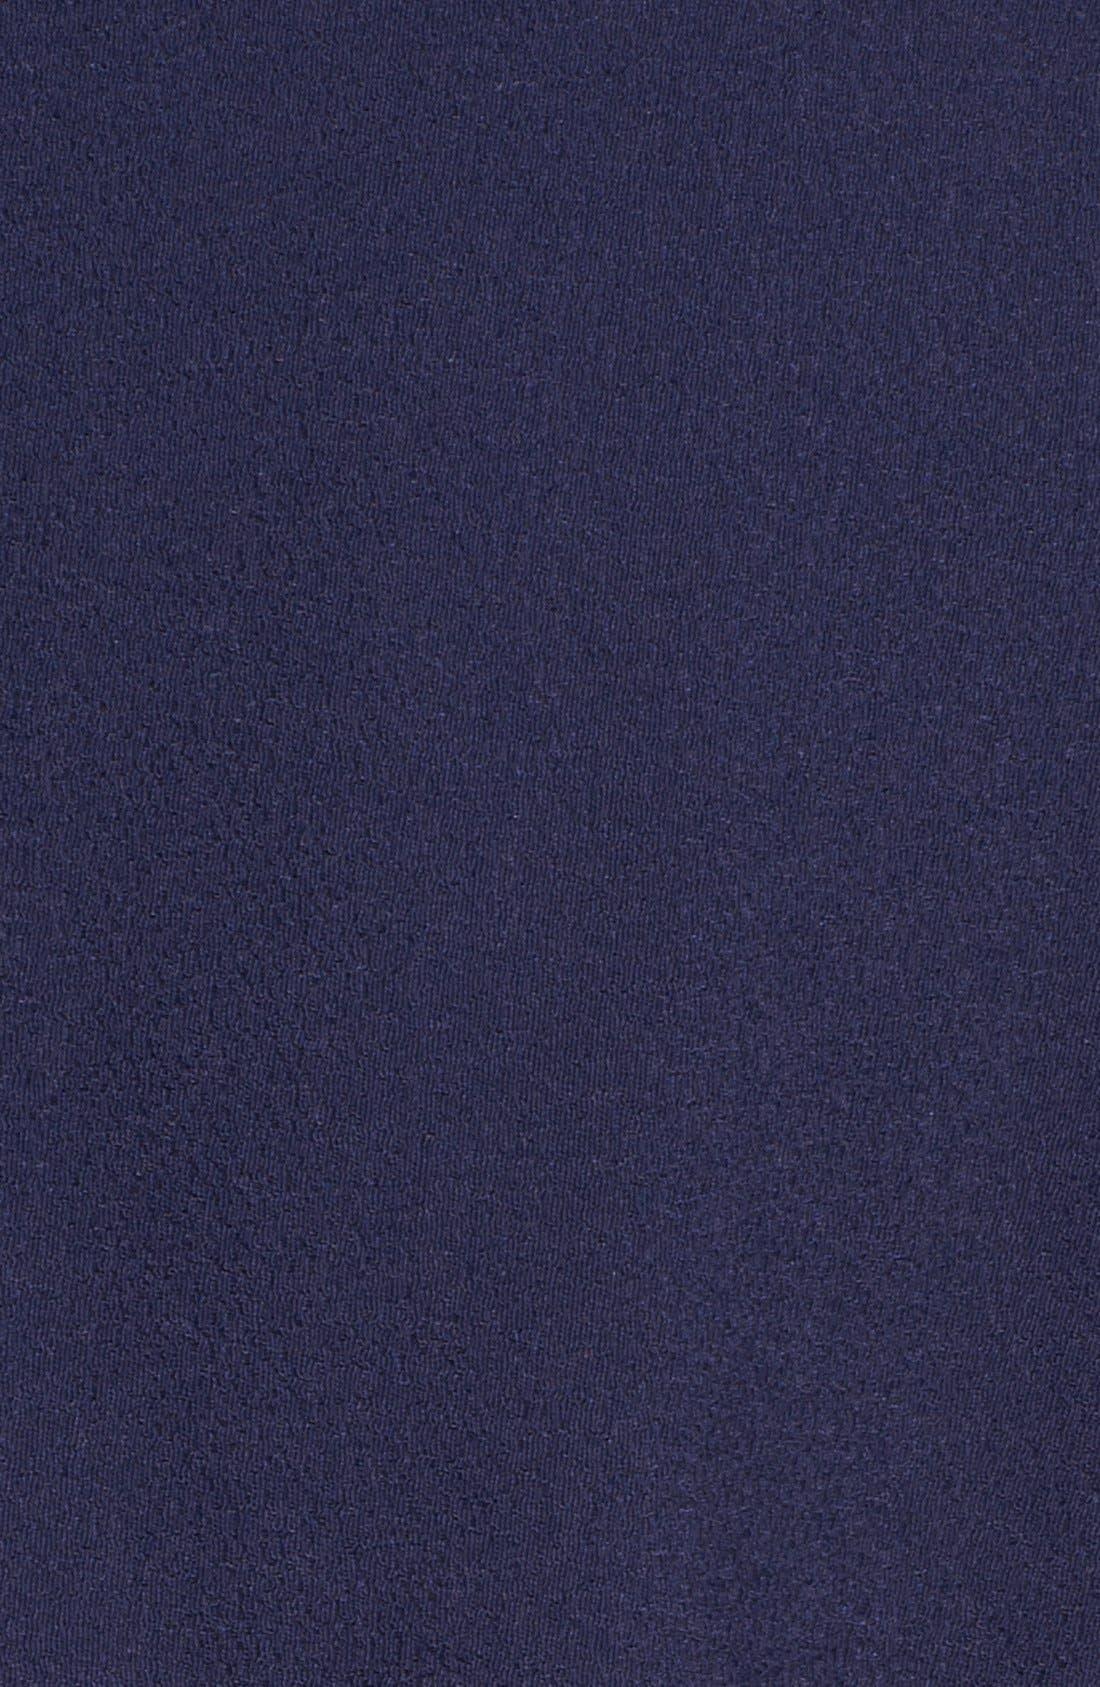 Alternate Image 3  - Diane von Furstenberg 'Dezi' Jumpsuit